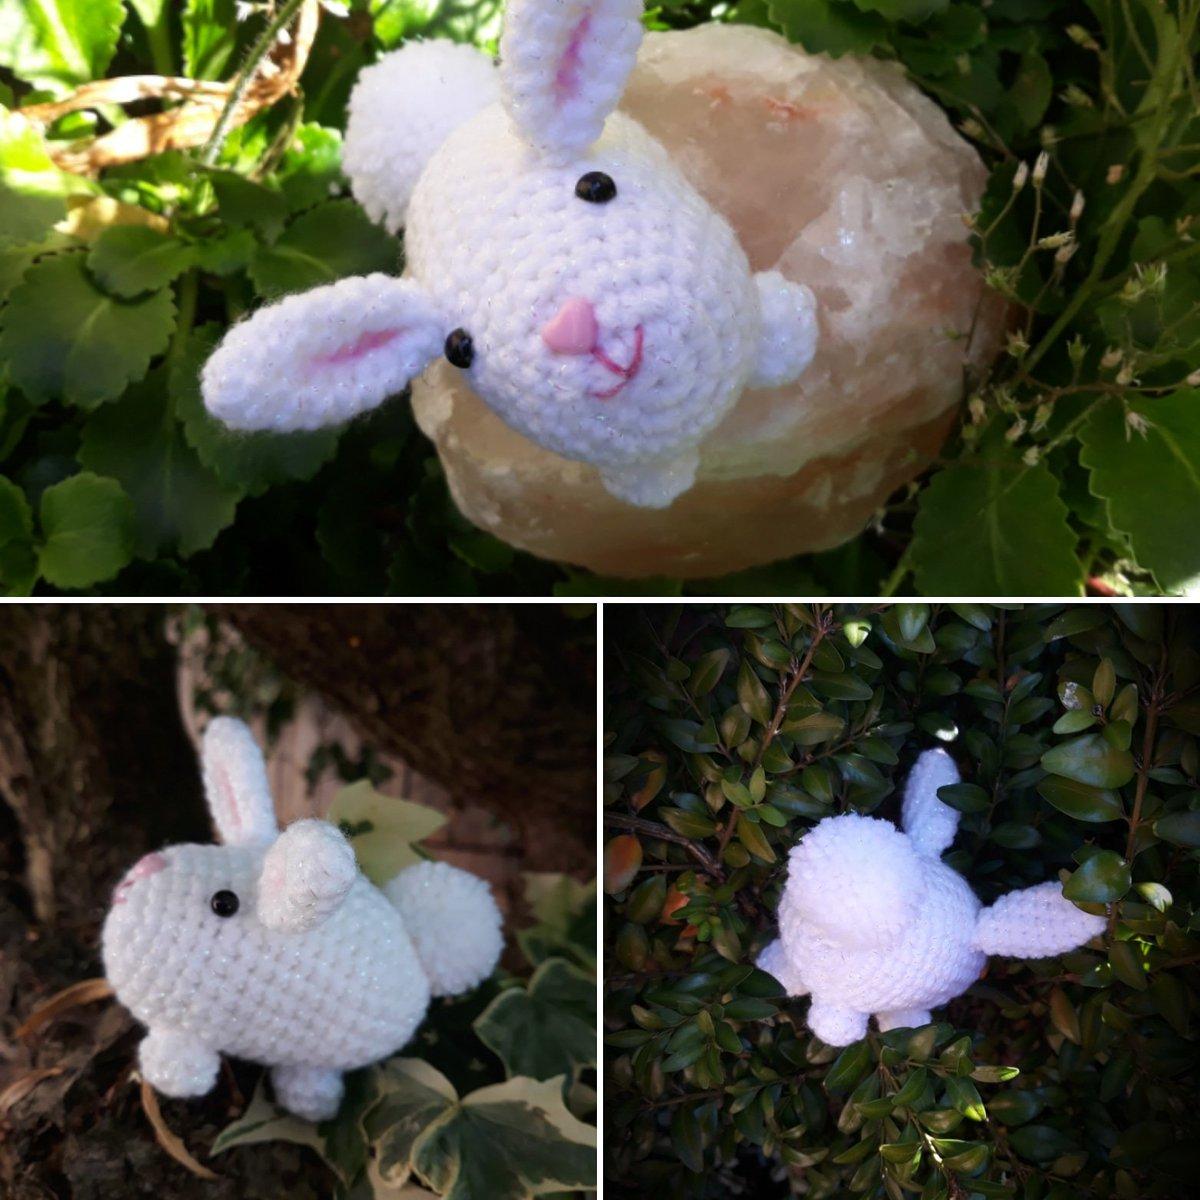 Crochet Amigurumi Cute Rabbit Bunny with Carrot Stuffed Animal | Etsy | 1200x1200